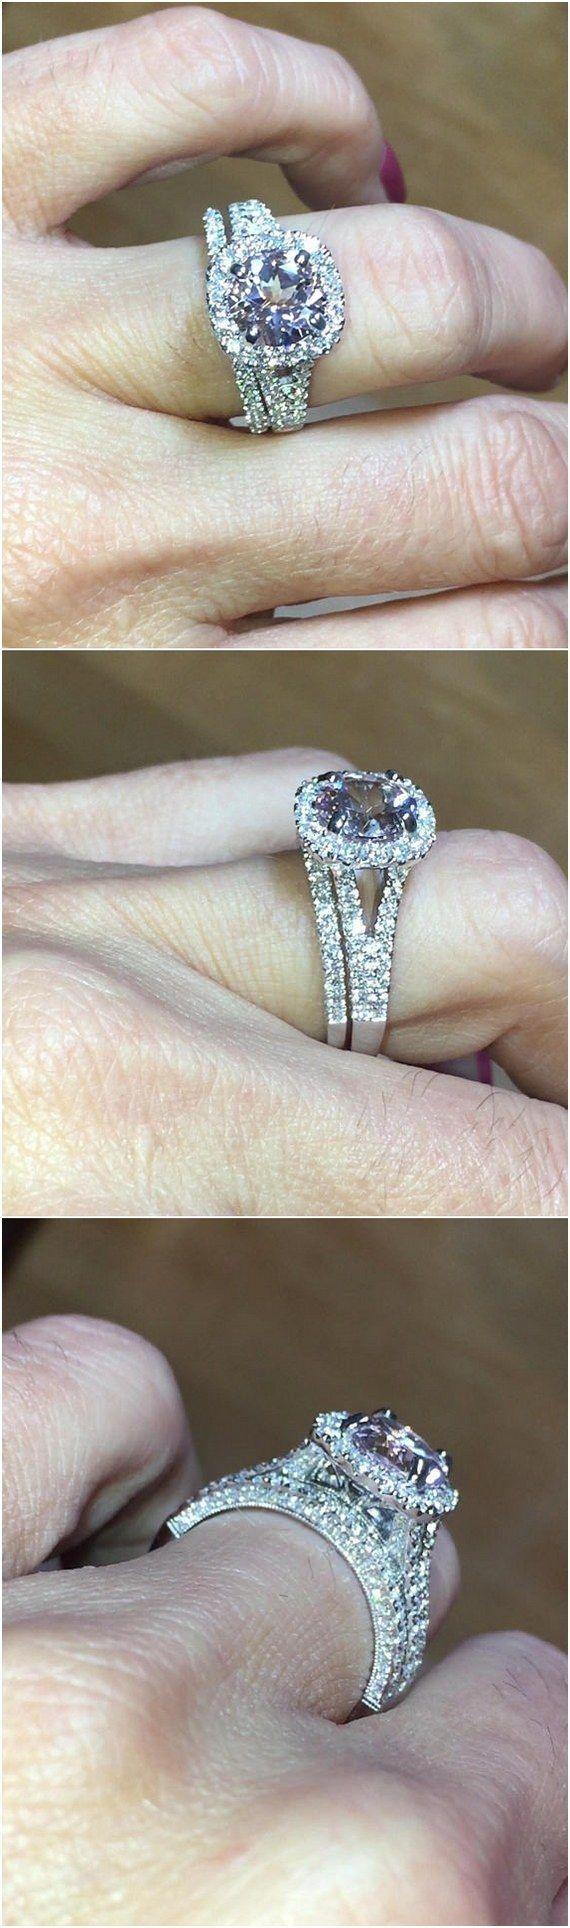 Hochzeit - Top 12 Custom Diamond Engagement Rings